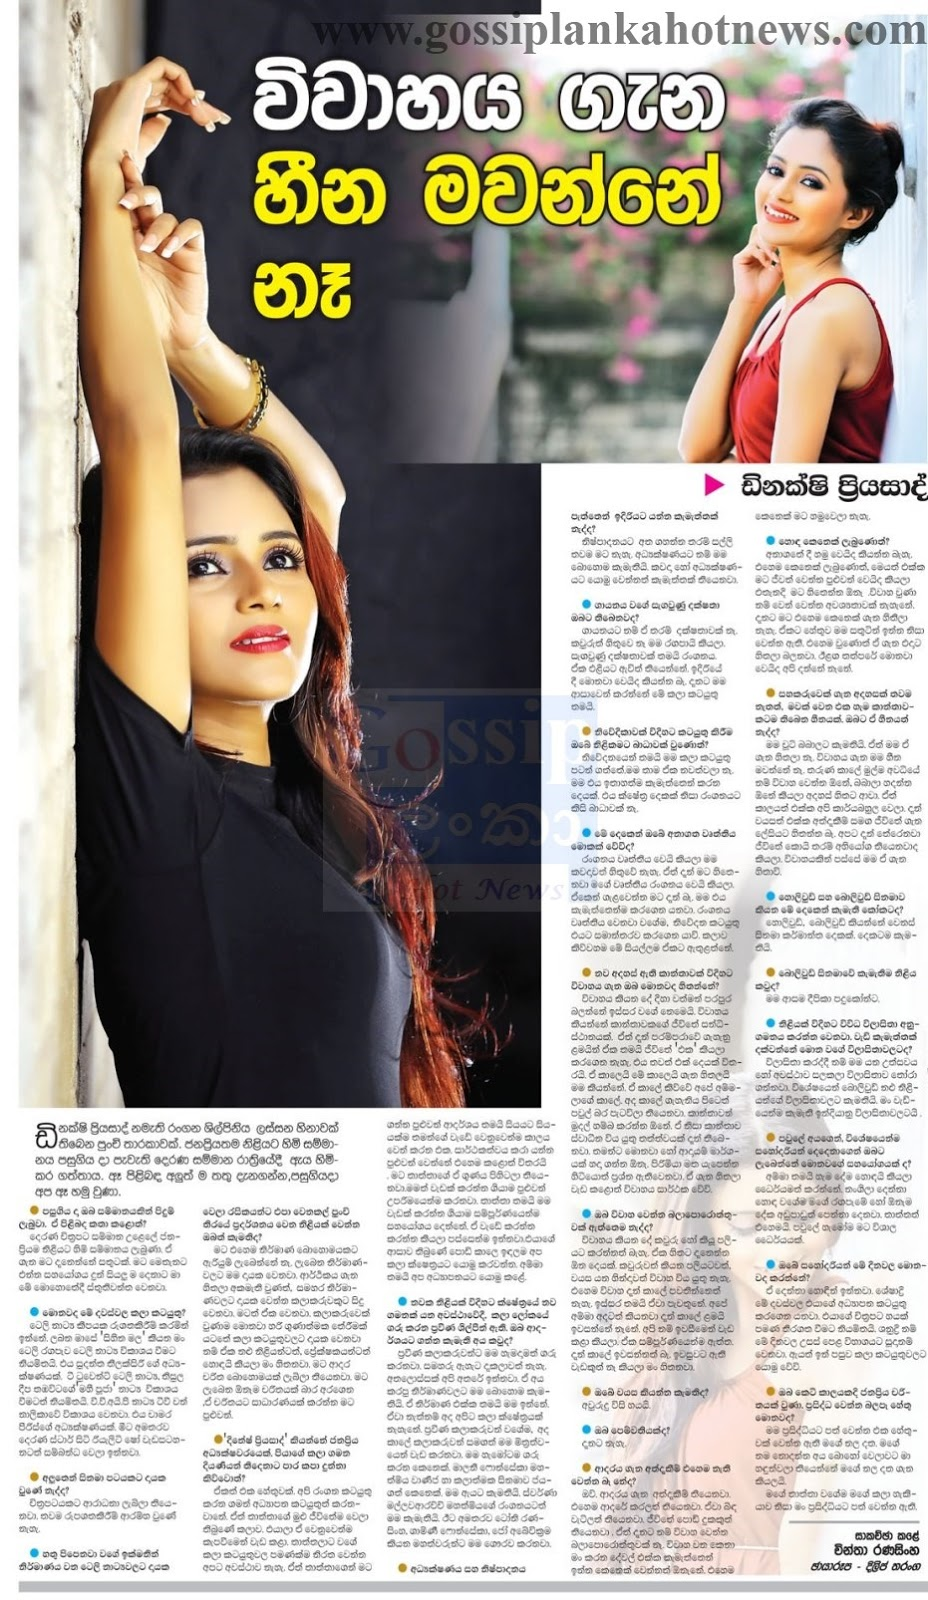 Gossip Chat With Dinakshi Priyasad - Gossip Lanka News